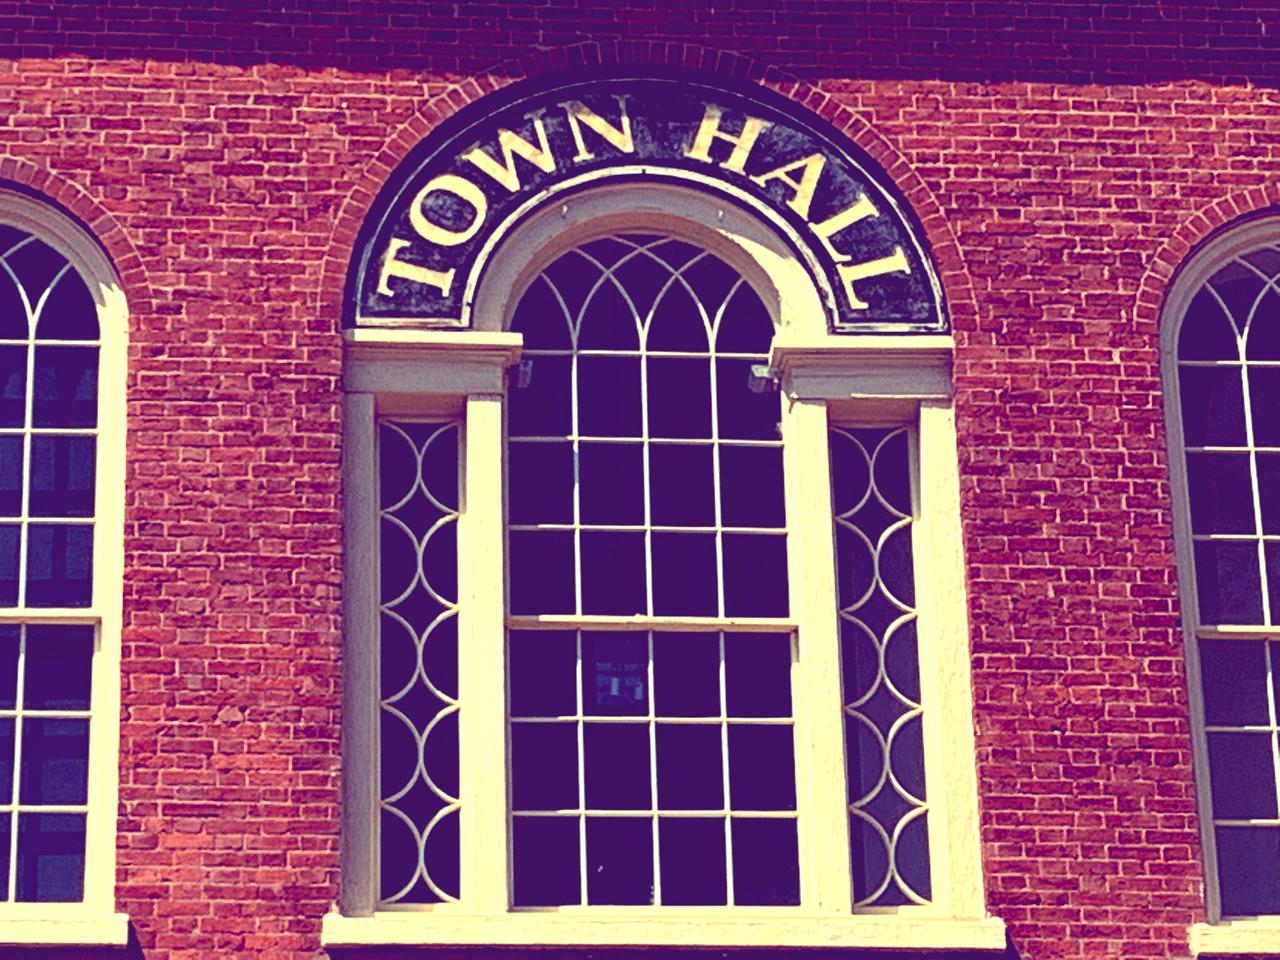 old-town-hall-salem-massachusetts-1280x960-05